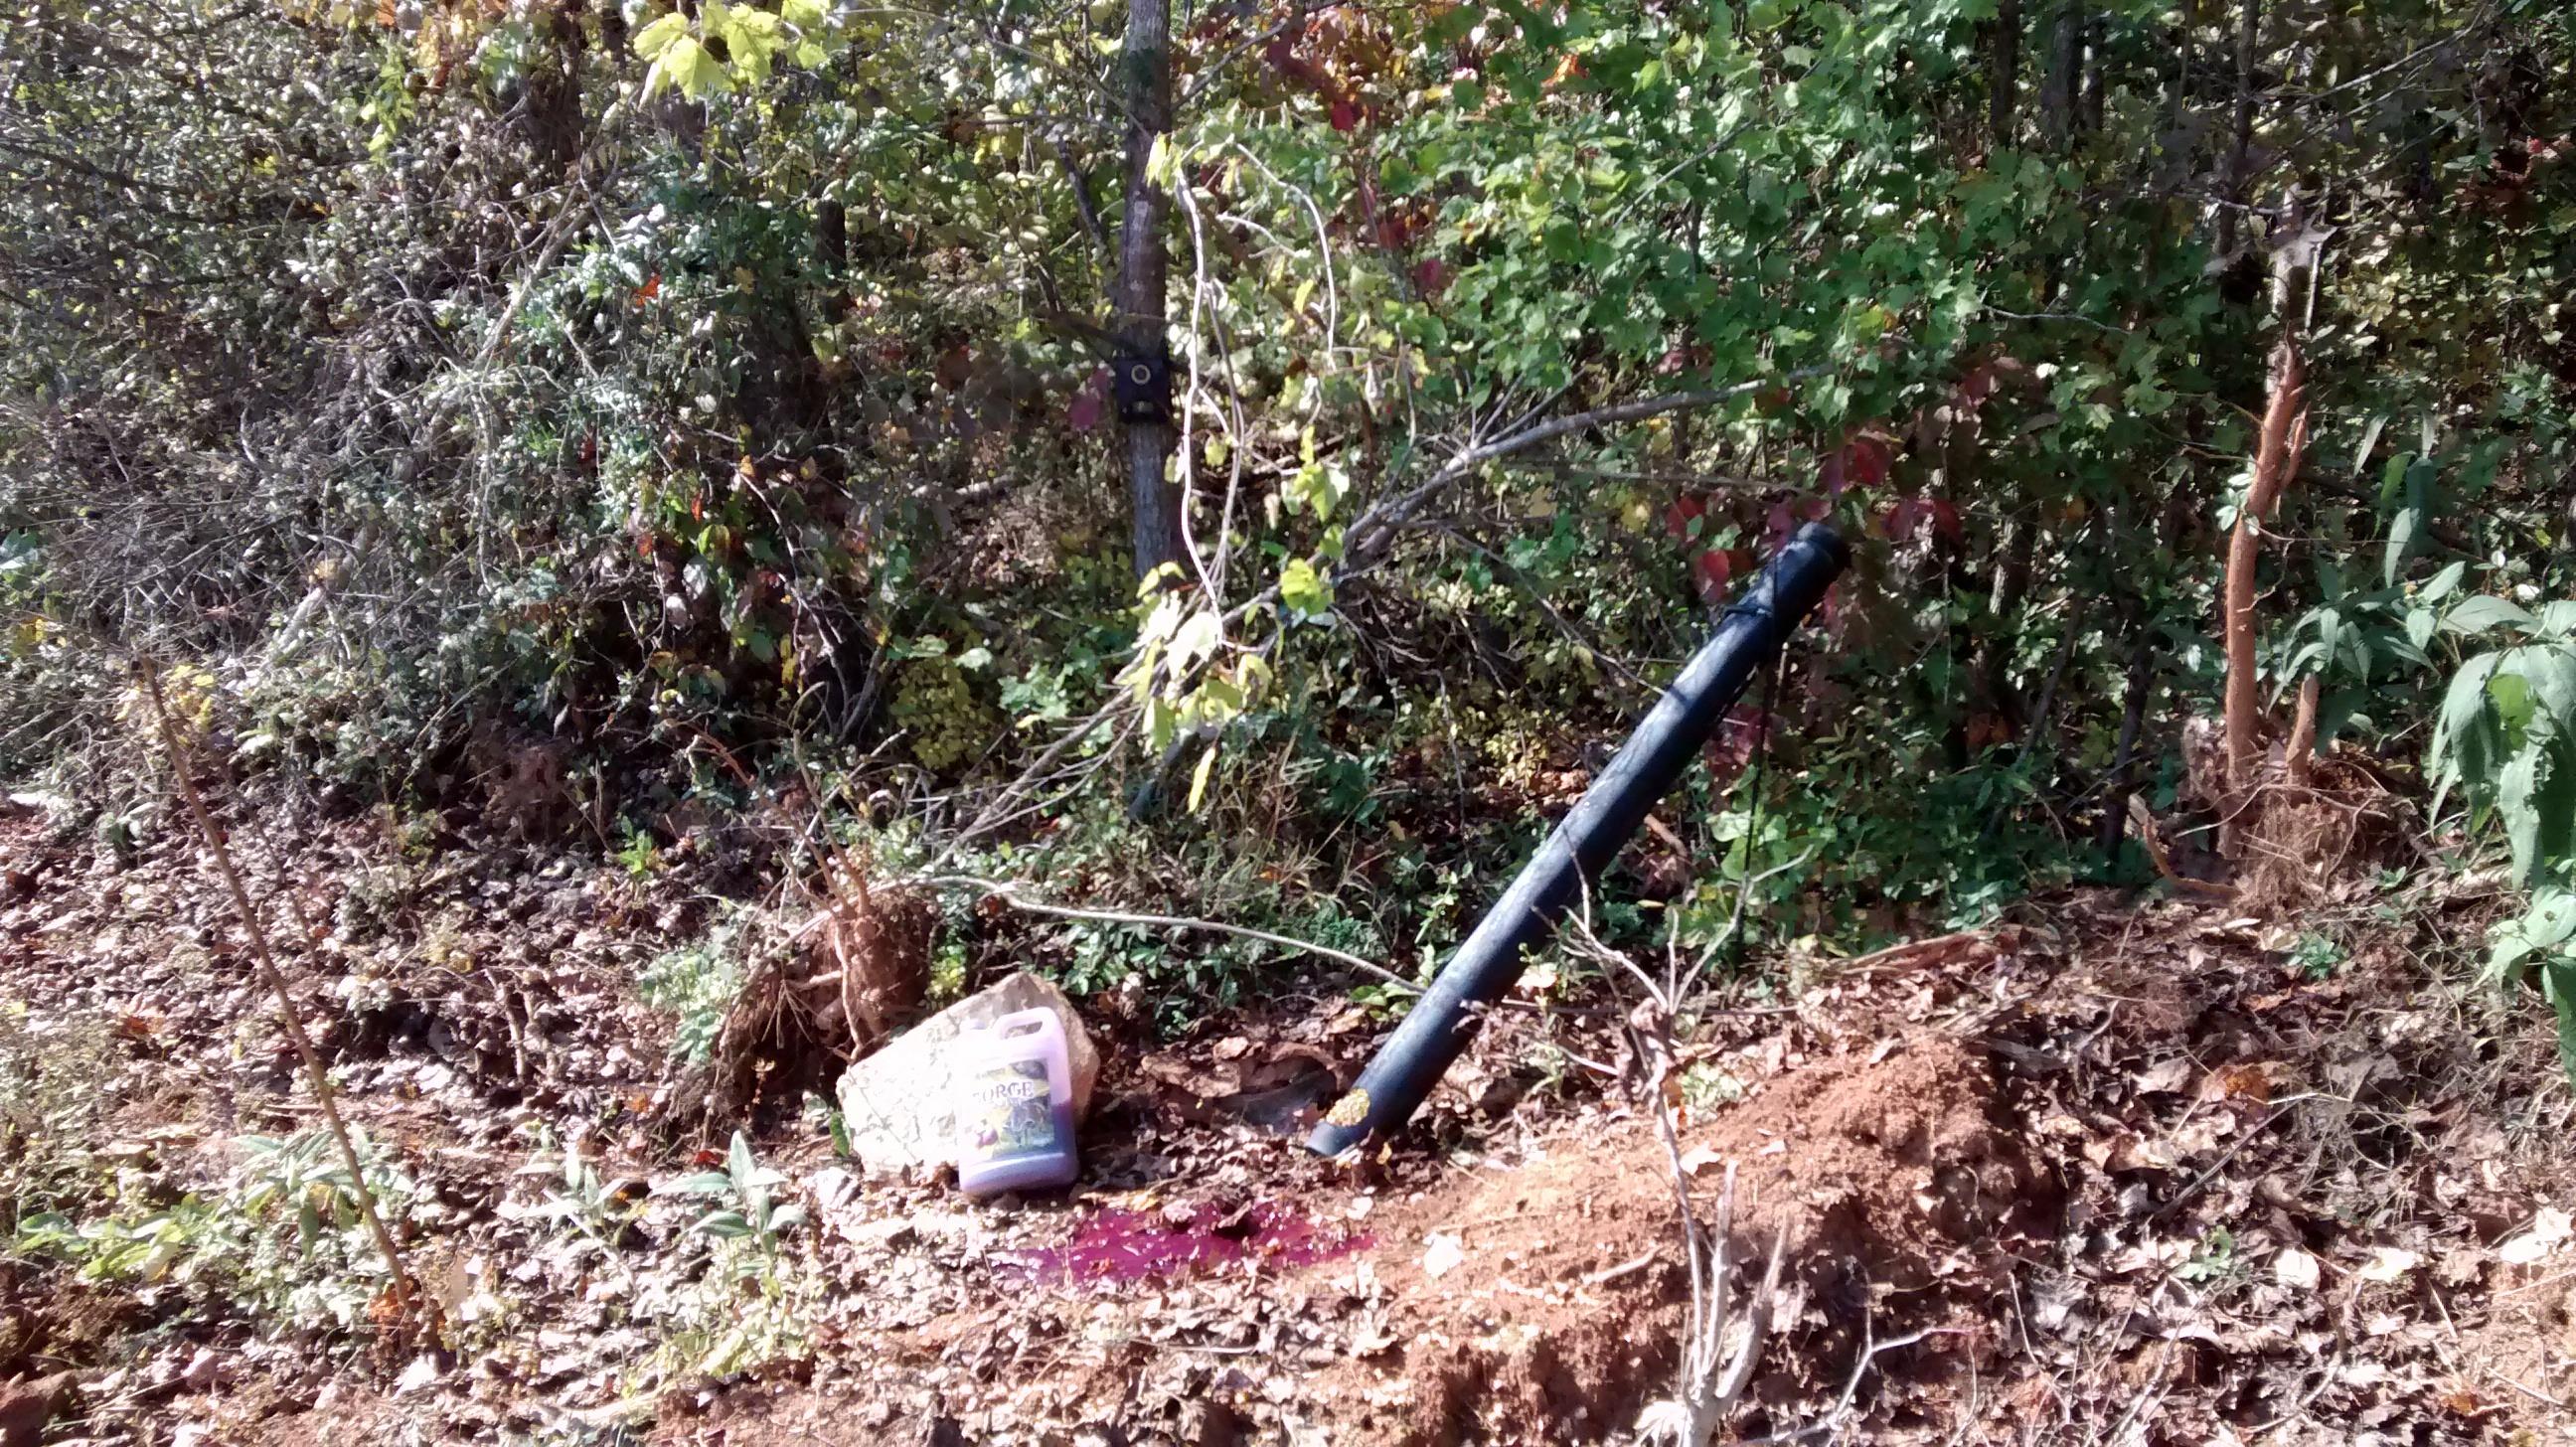 DIY PVC deer feeder 4″ sewer pipe in field with liquid attractant